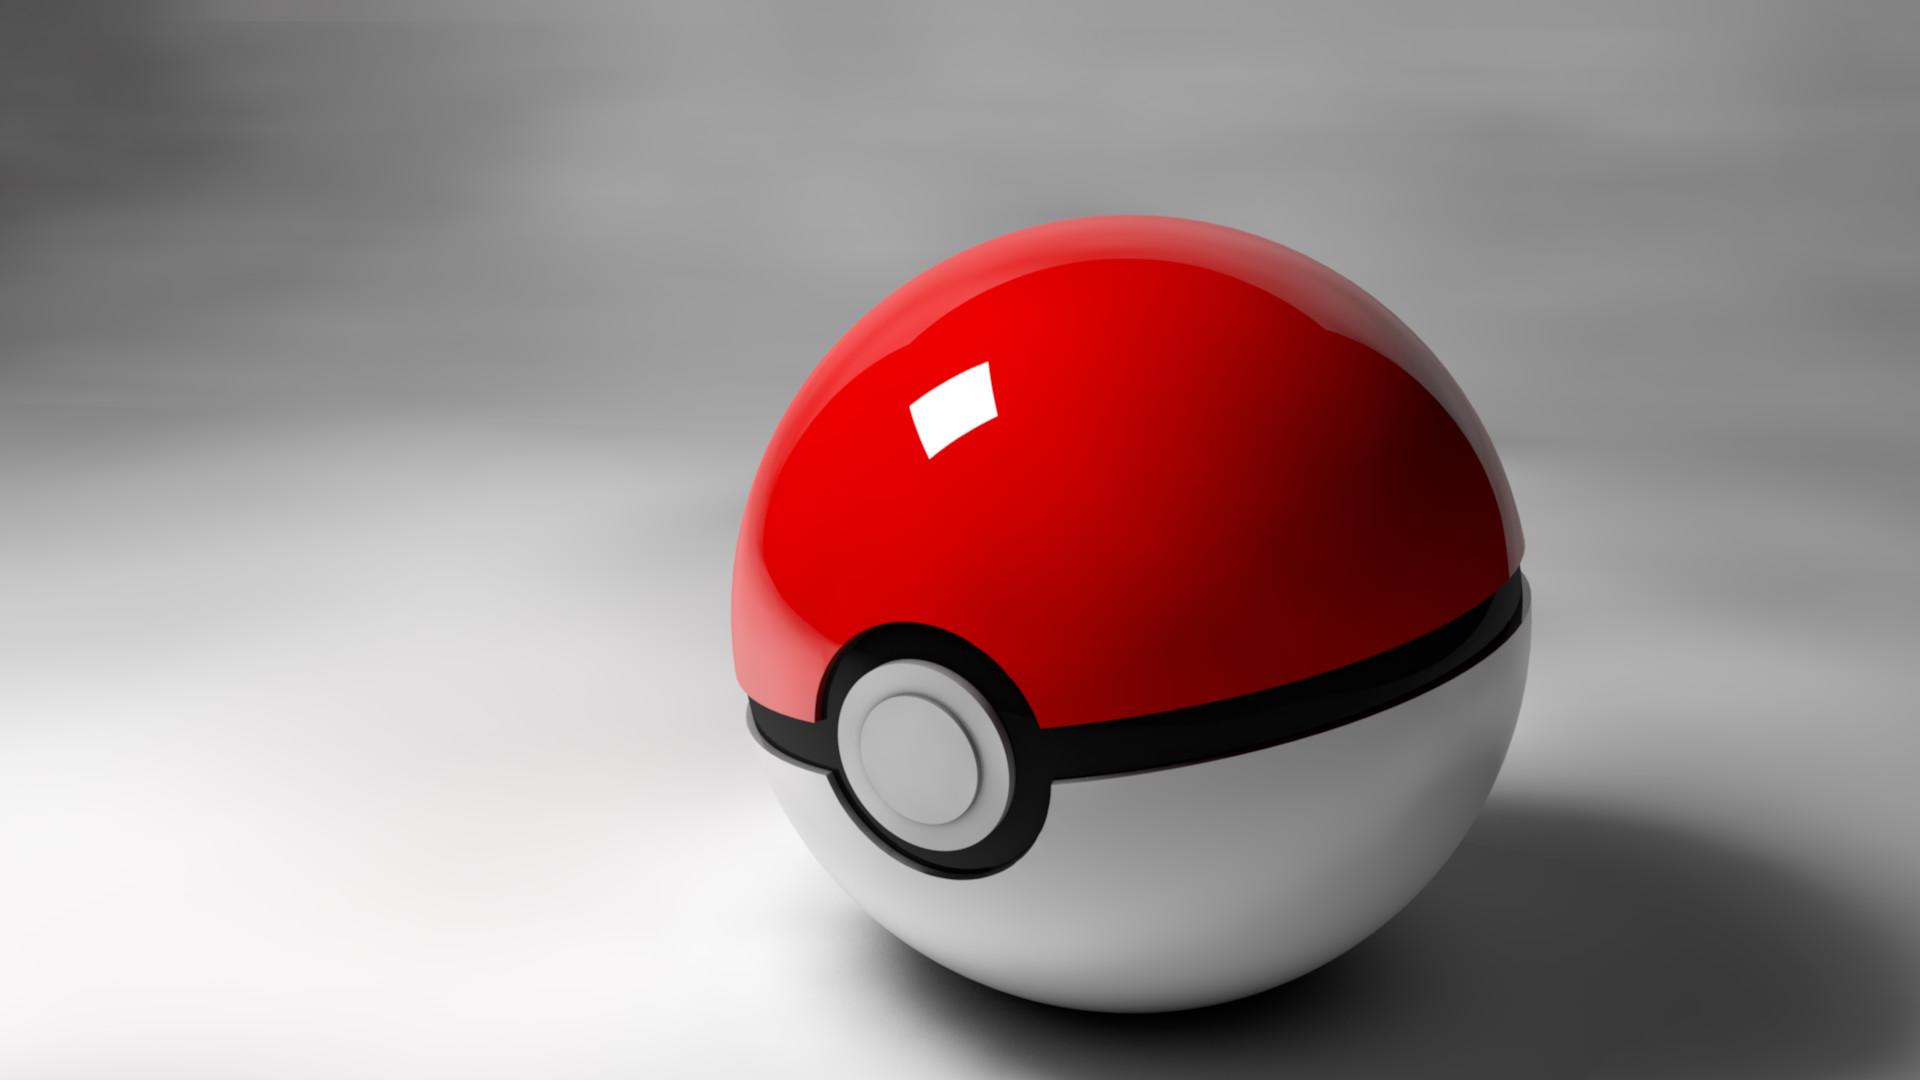 Res: 1920x1080, Pokeball Wallpaper Backgrounds Pokemon Ball Hd For Mobile Phones Pics